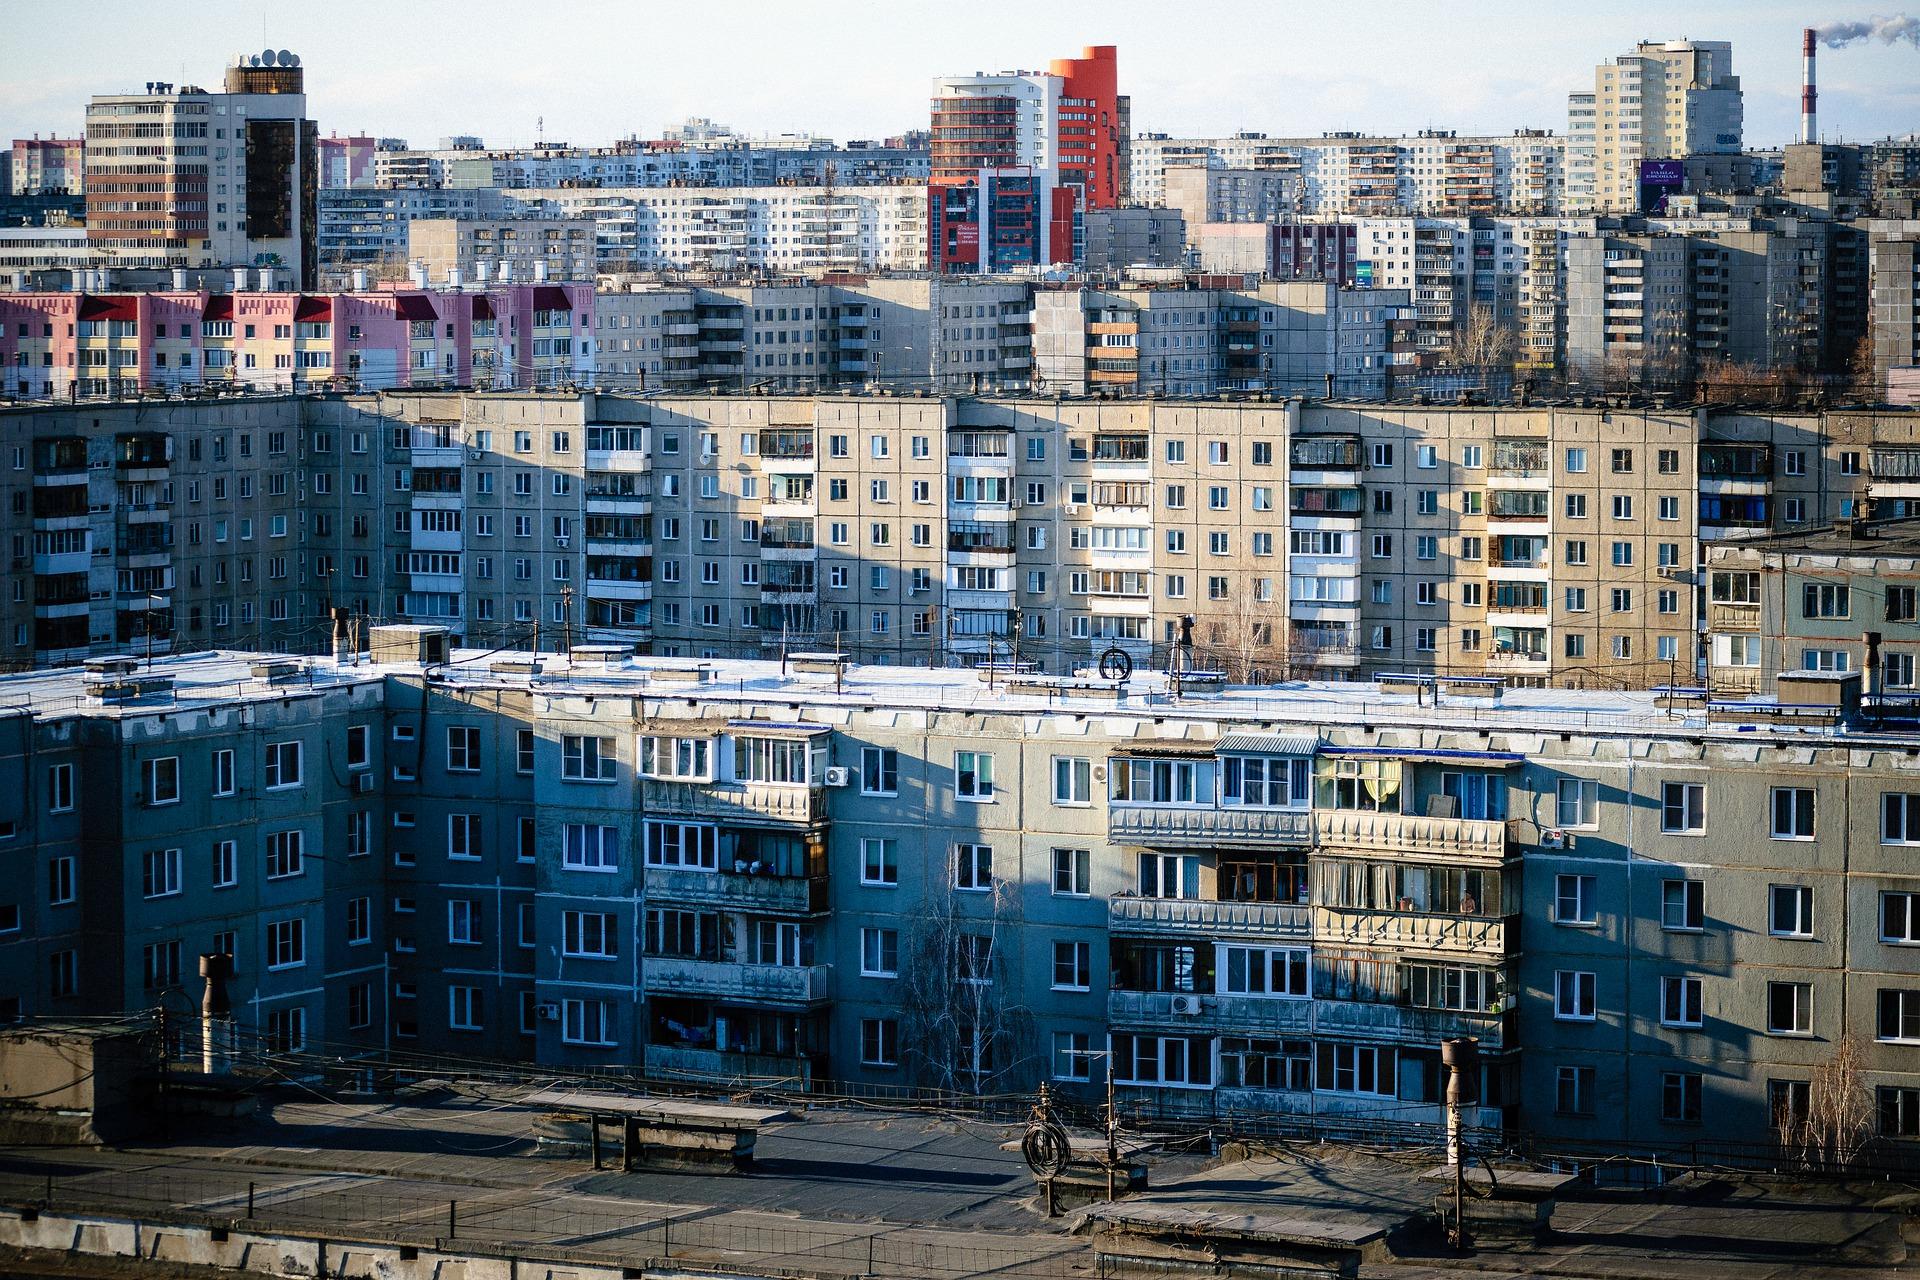 Image d'immeubles par Nikita Volodko de Pixabay